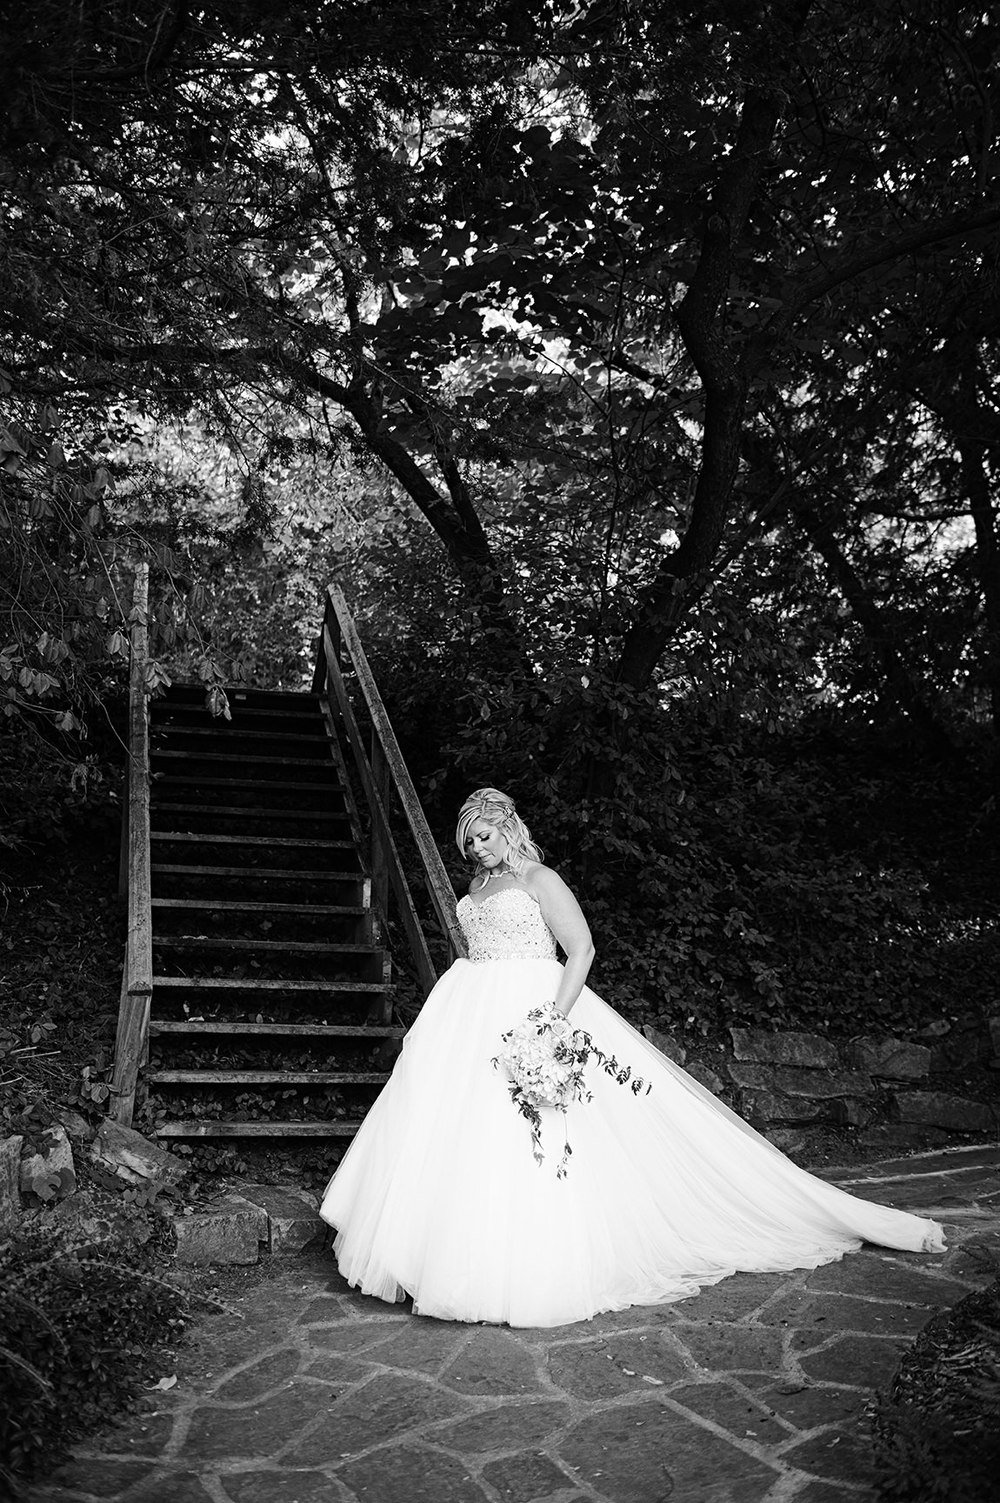 St-Catharines-Wedding-Stone-Mill-Inn-Amy-Darryl-photography-by-Morgan-Falk-039.JPG